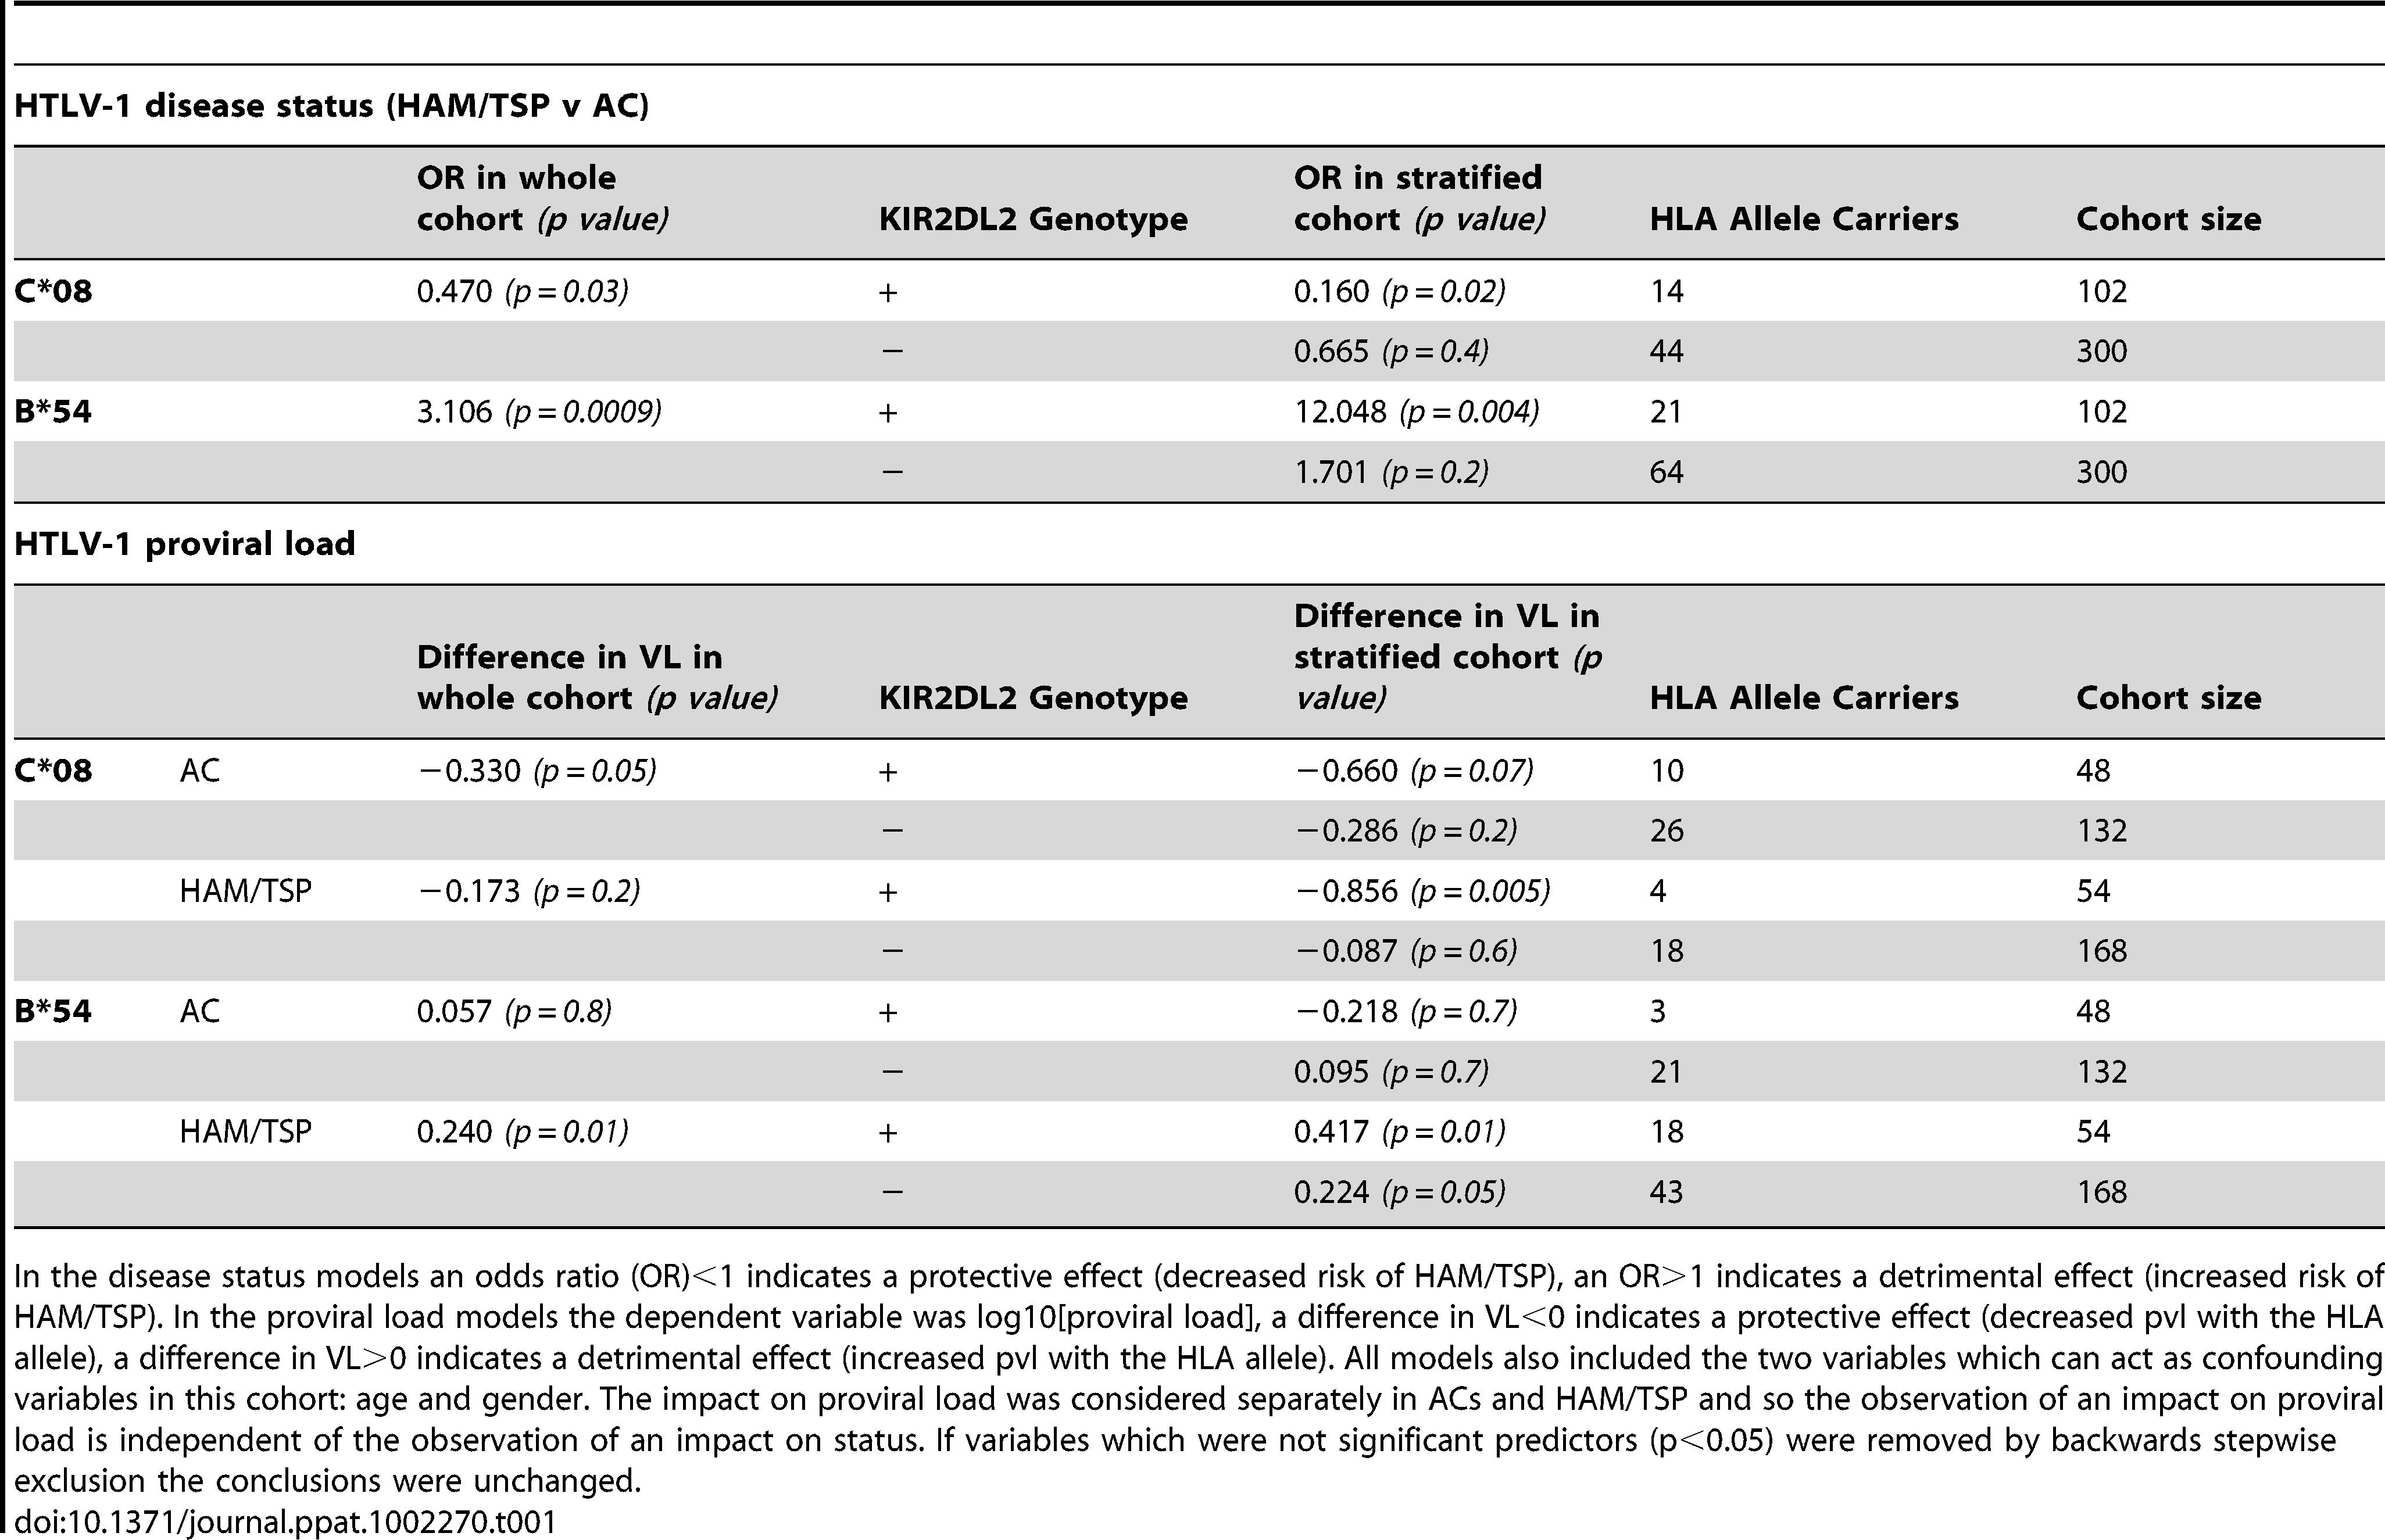 <i>KIR2DL2</i> in HTLV-1 infection: <i>KIR2DL2</i> enhances the protective effect of <i>C*08</i> and the detrimental effect of <i>B*54</i> on HAM/TSP risk and, independently, on proviral load.